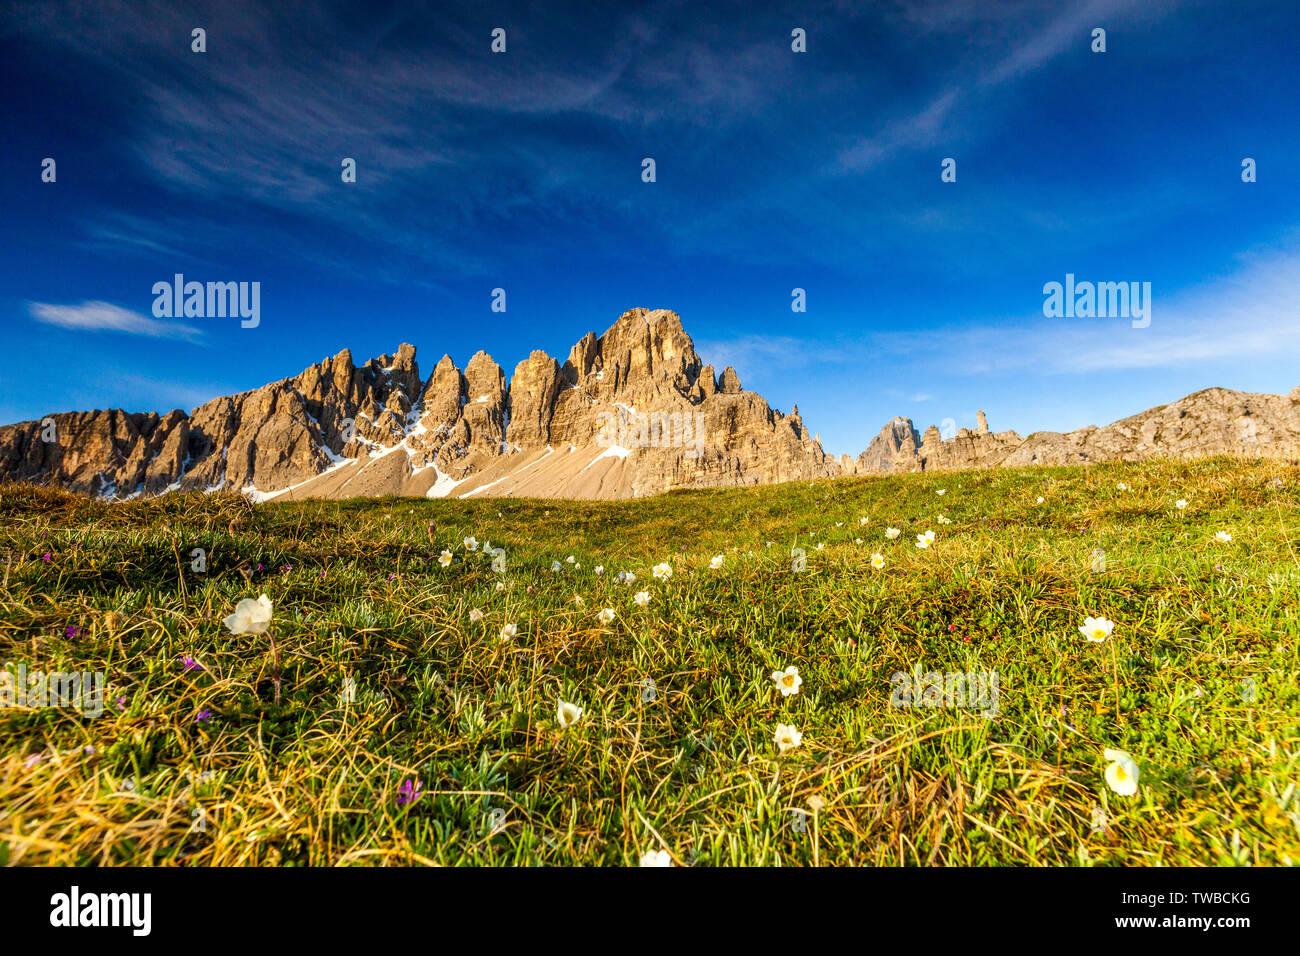 Monte Paterno (Paternkofel) in spring, Sesto Dolomites Natural Park, Trentino-Alto Adige/South Tyrol, Italy - Stock Image